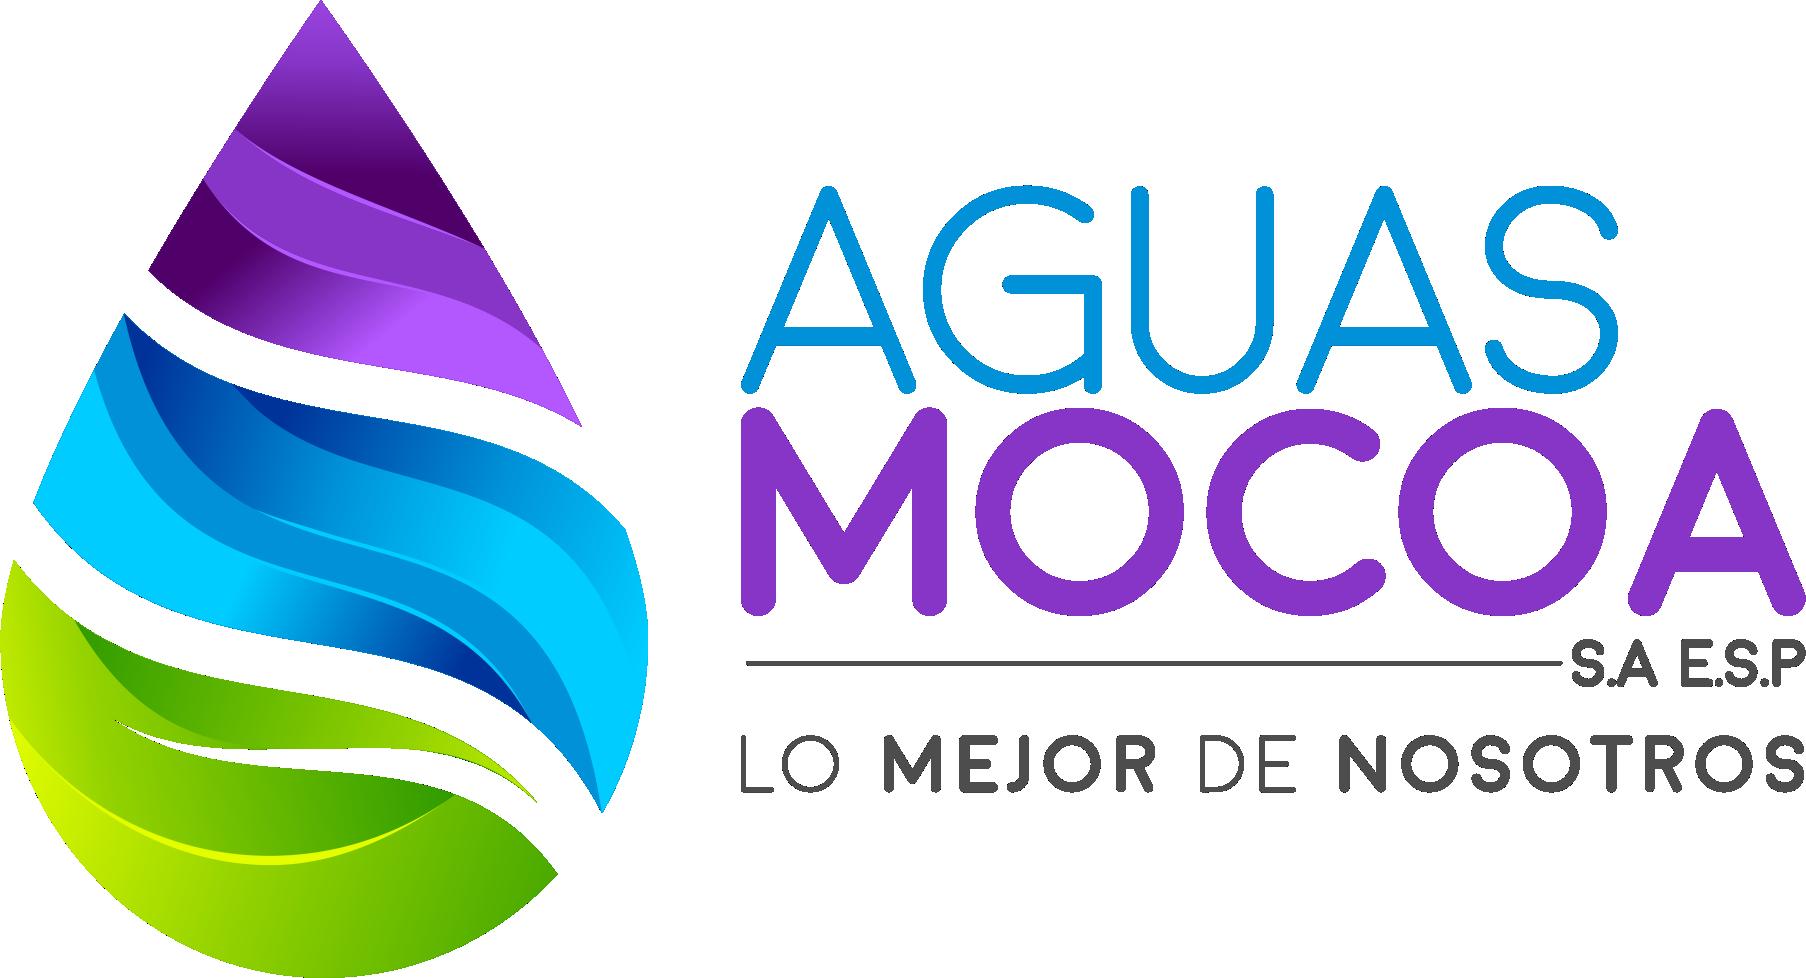 Aguas Mocoa S.A. E.S.P.